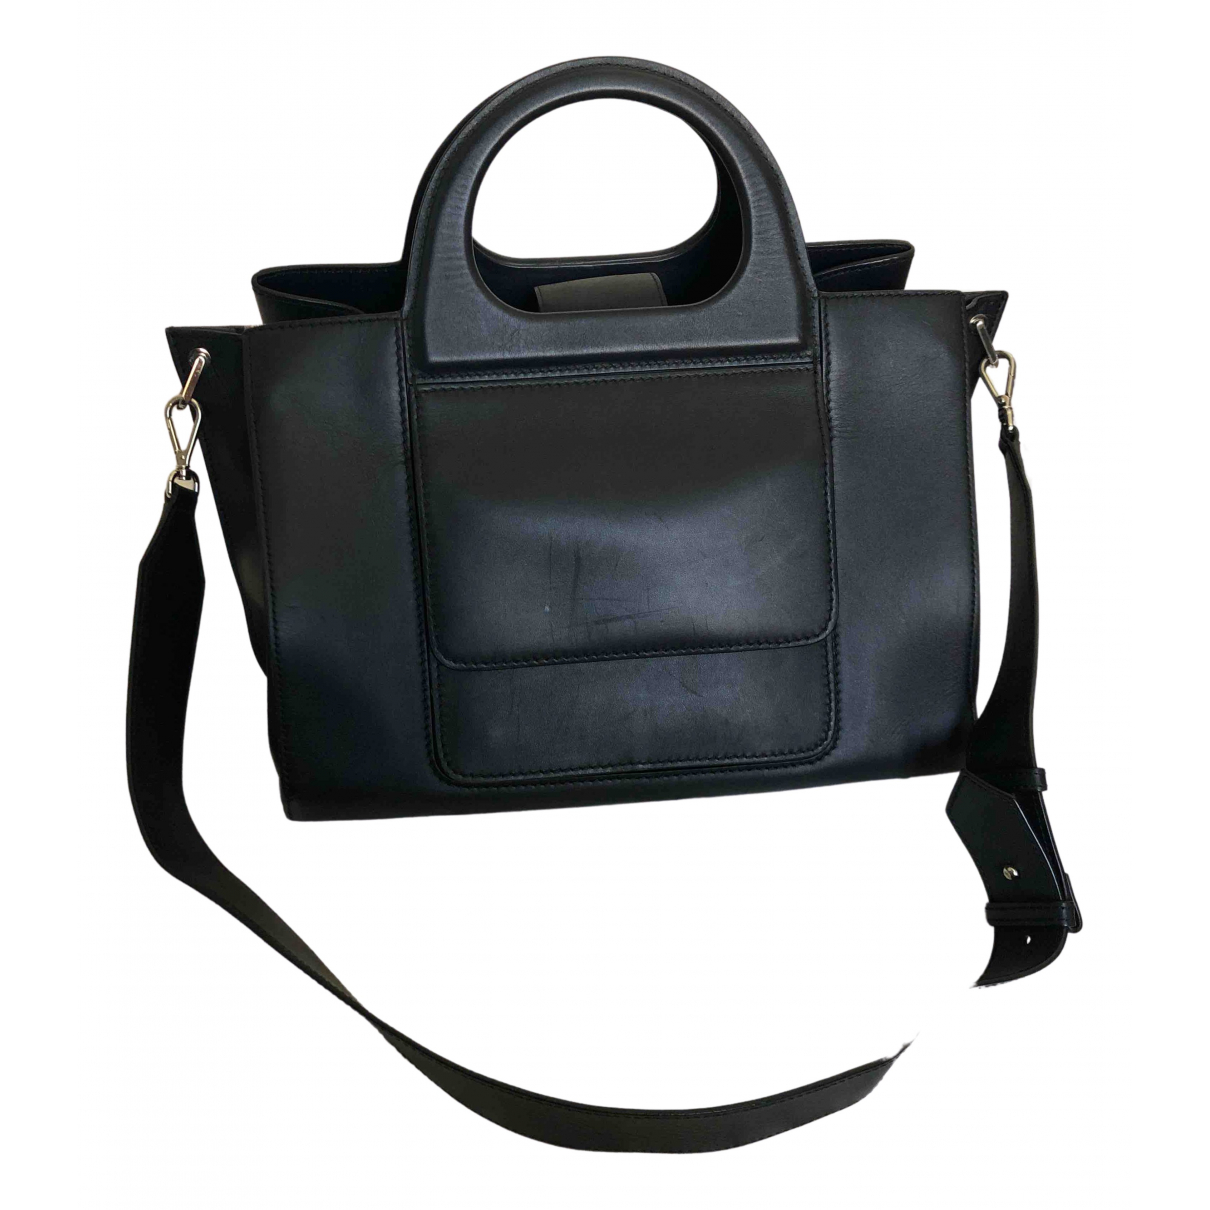 Max Mara N Blue Leather handbag for Women N